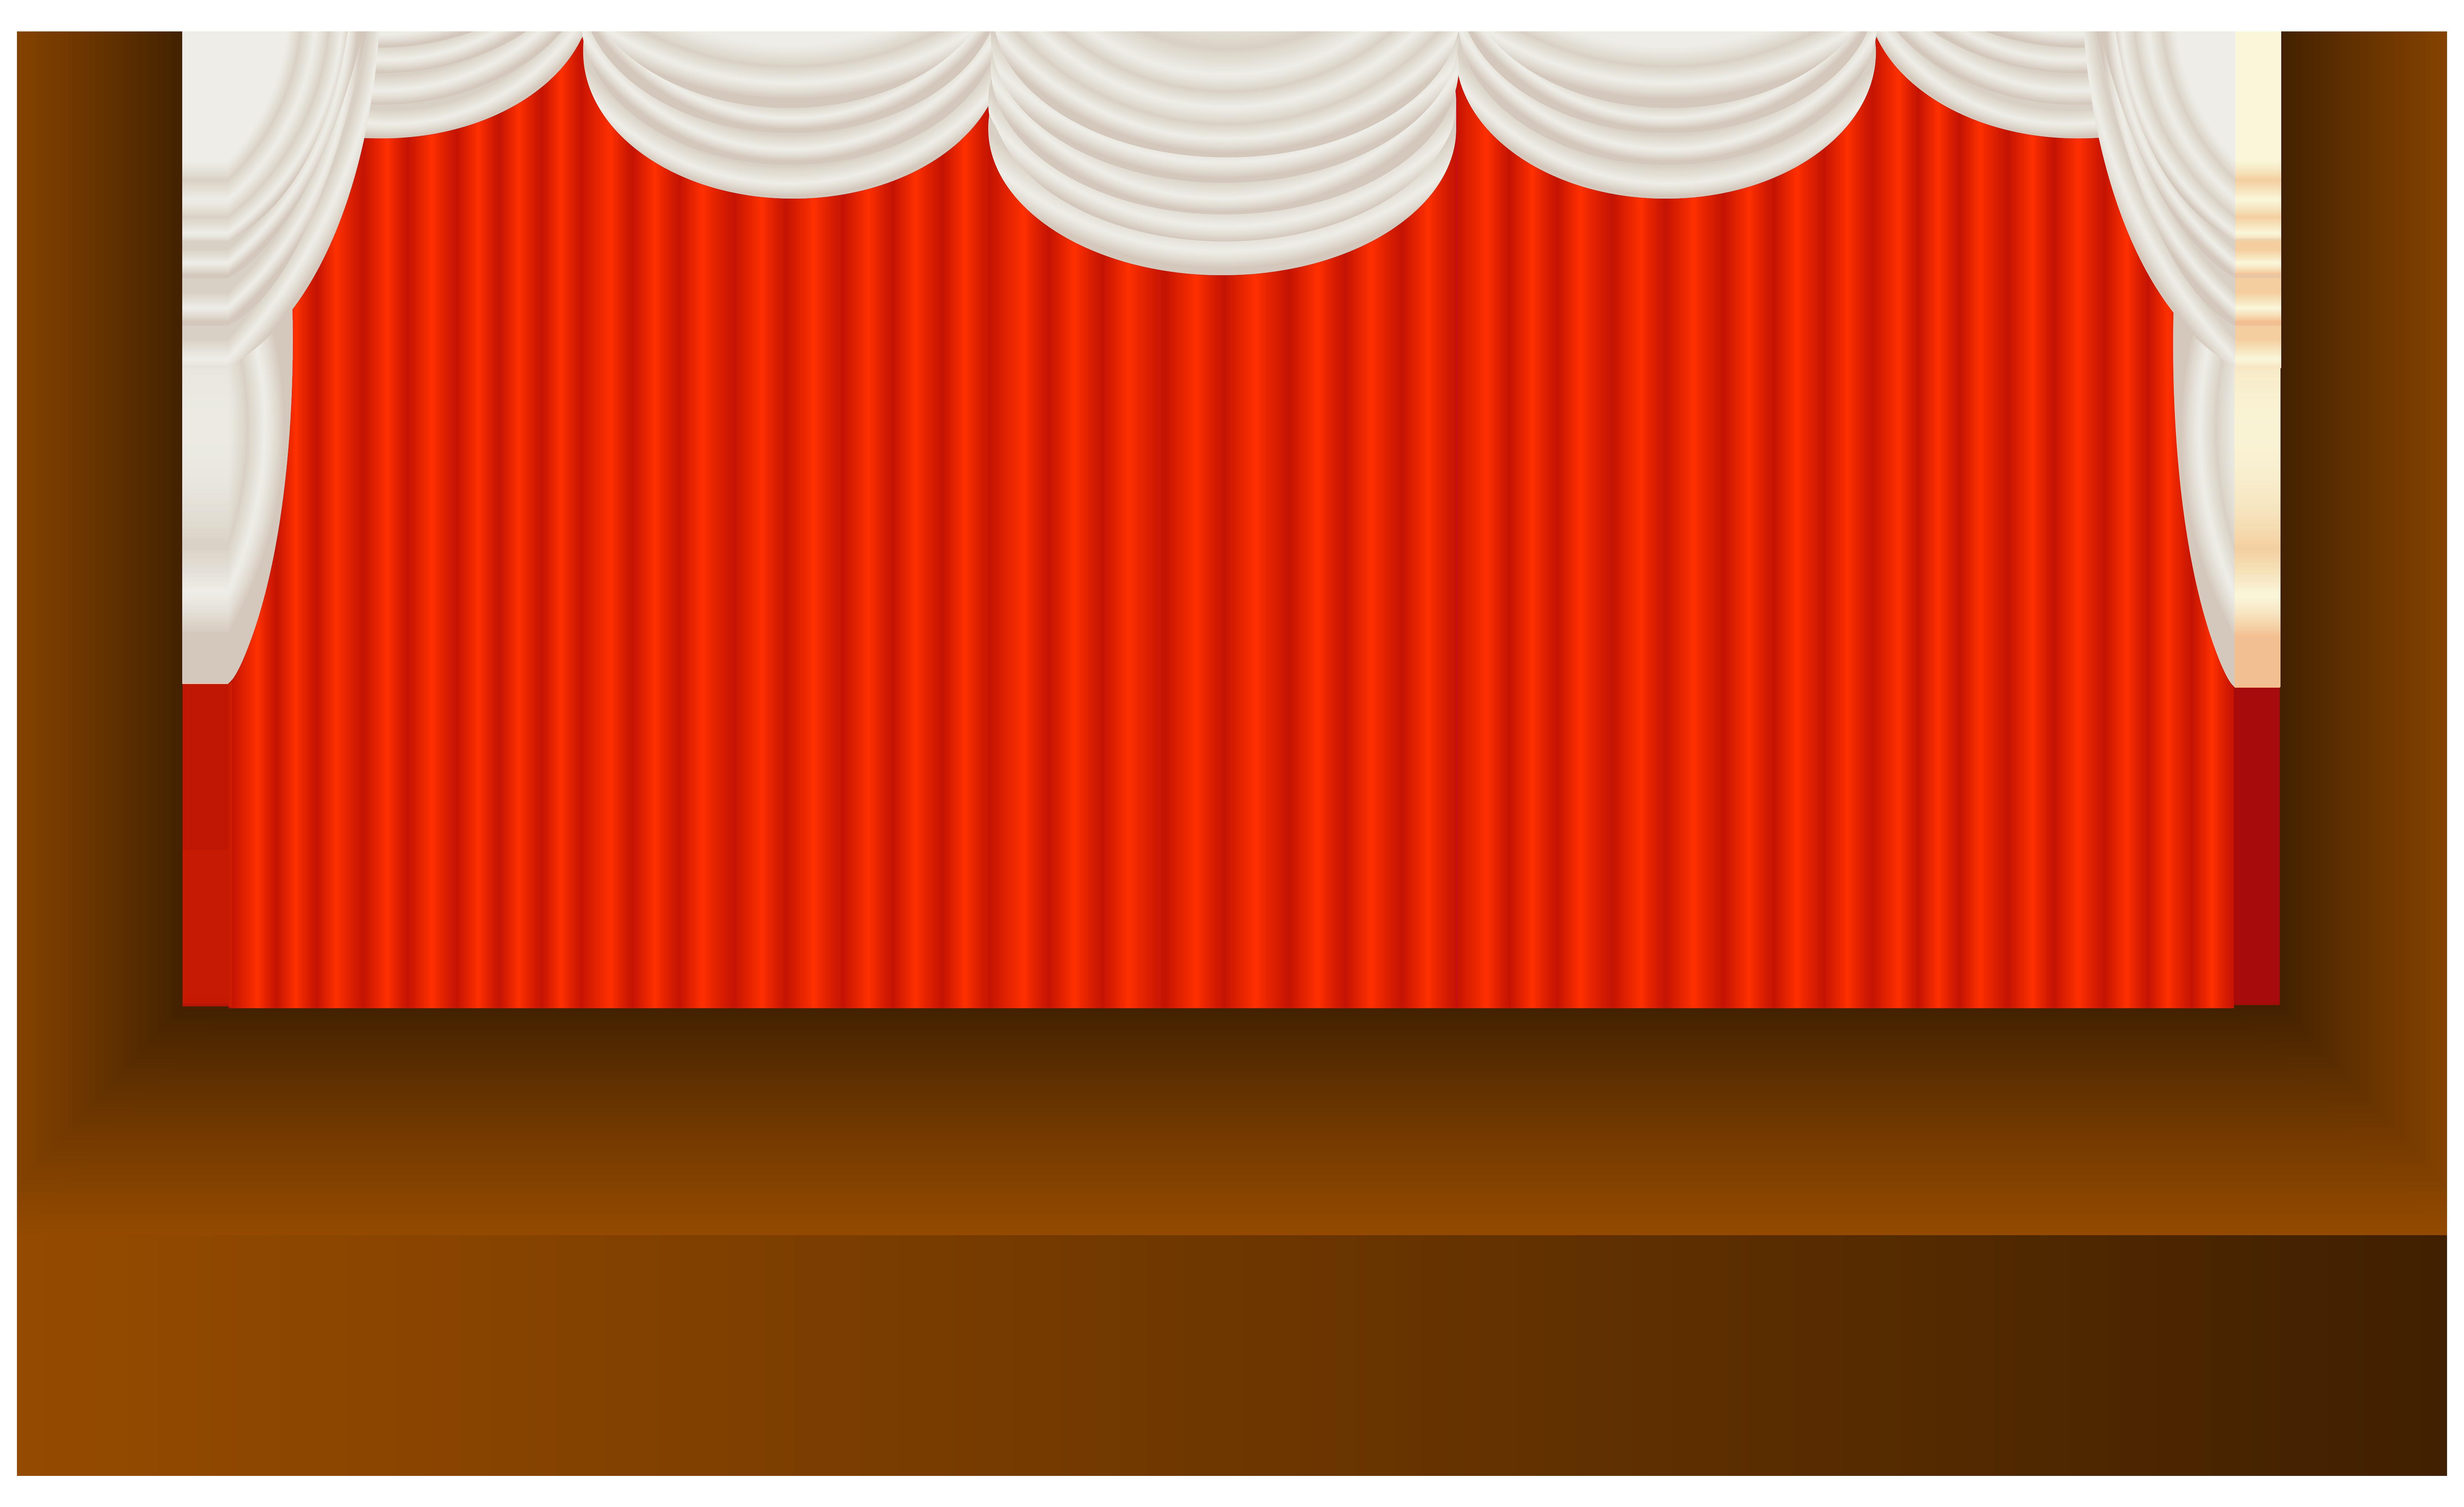 Stage PNG Transparent Clip Art Image.